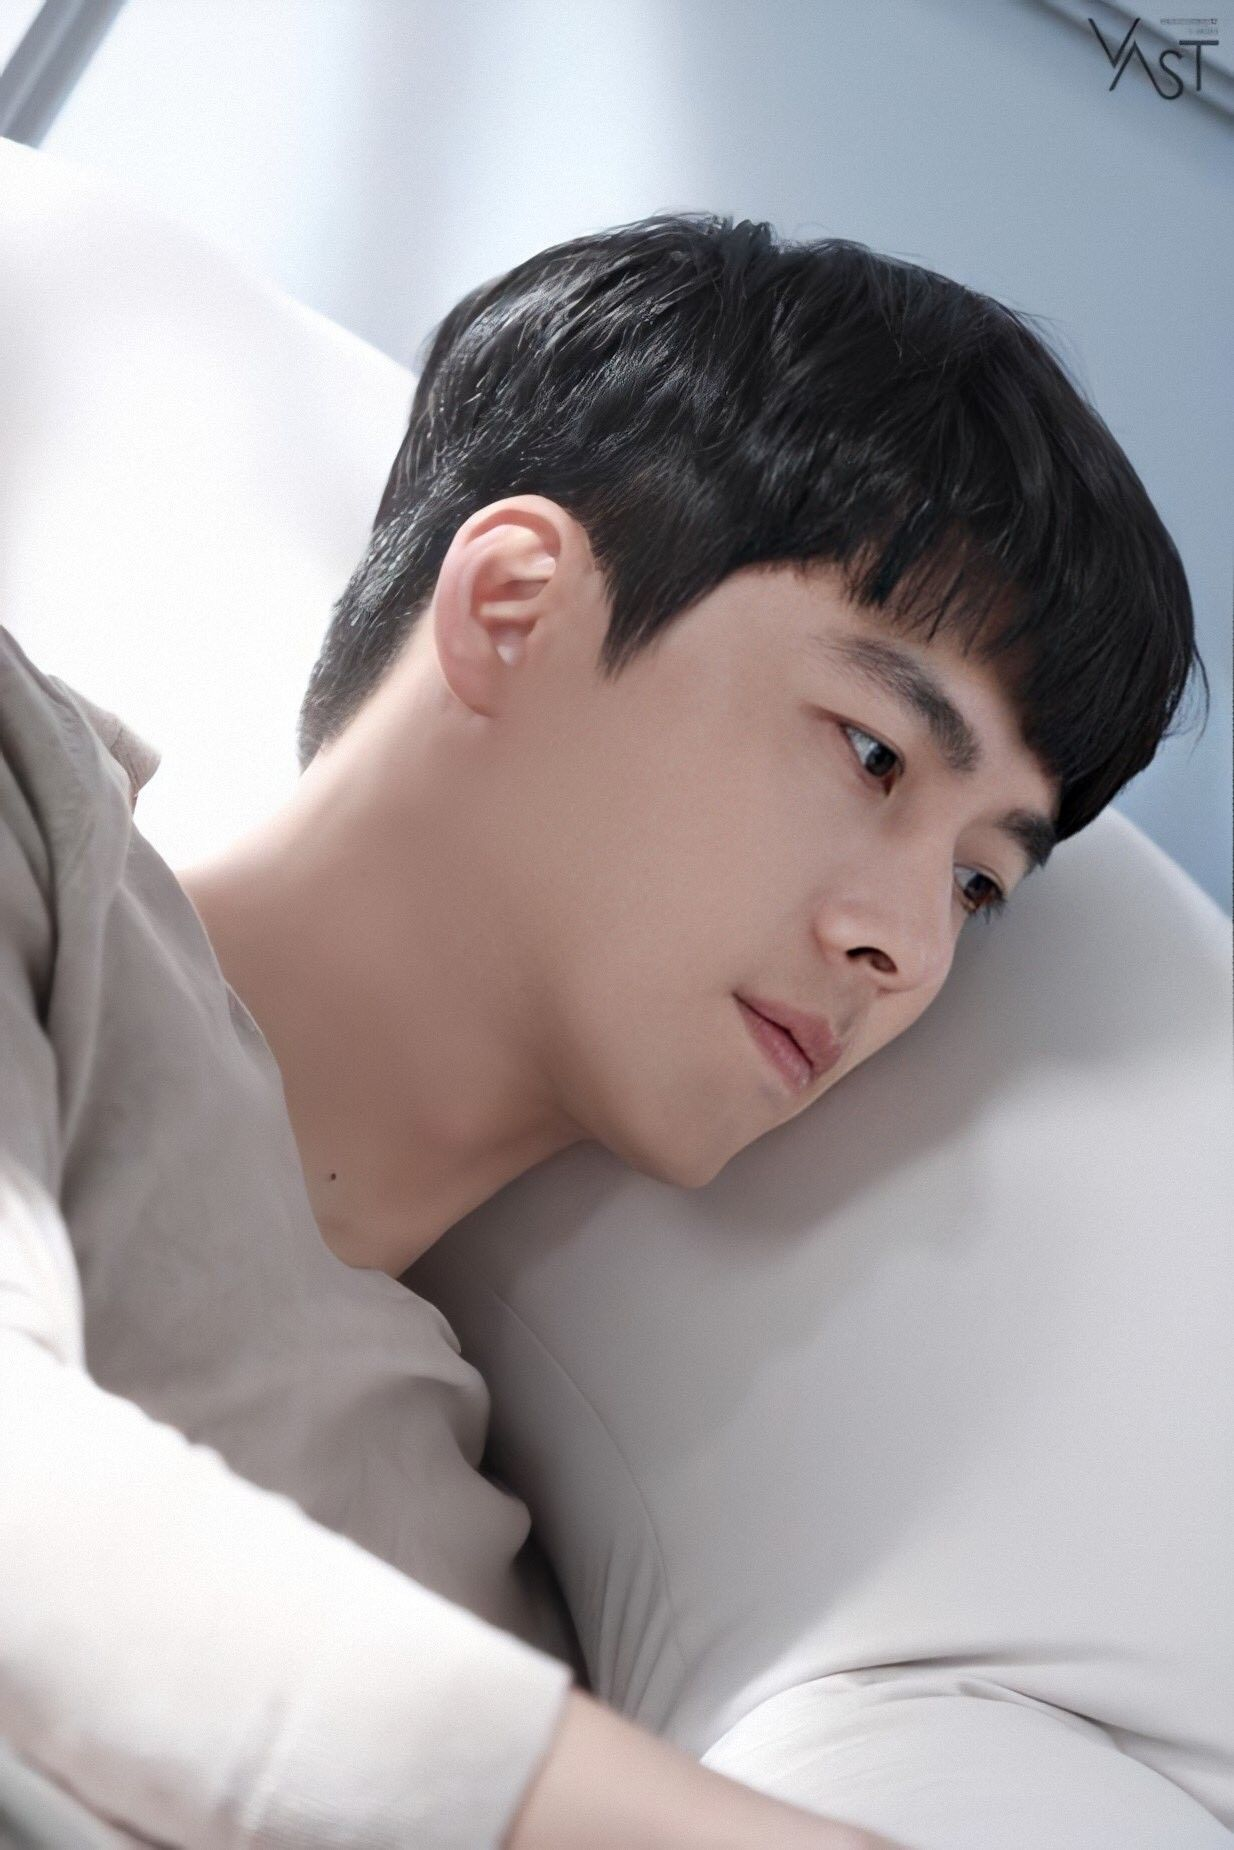 Pin by Relax on Amazing Kdramas in 2020 Hyun bin, Cha